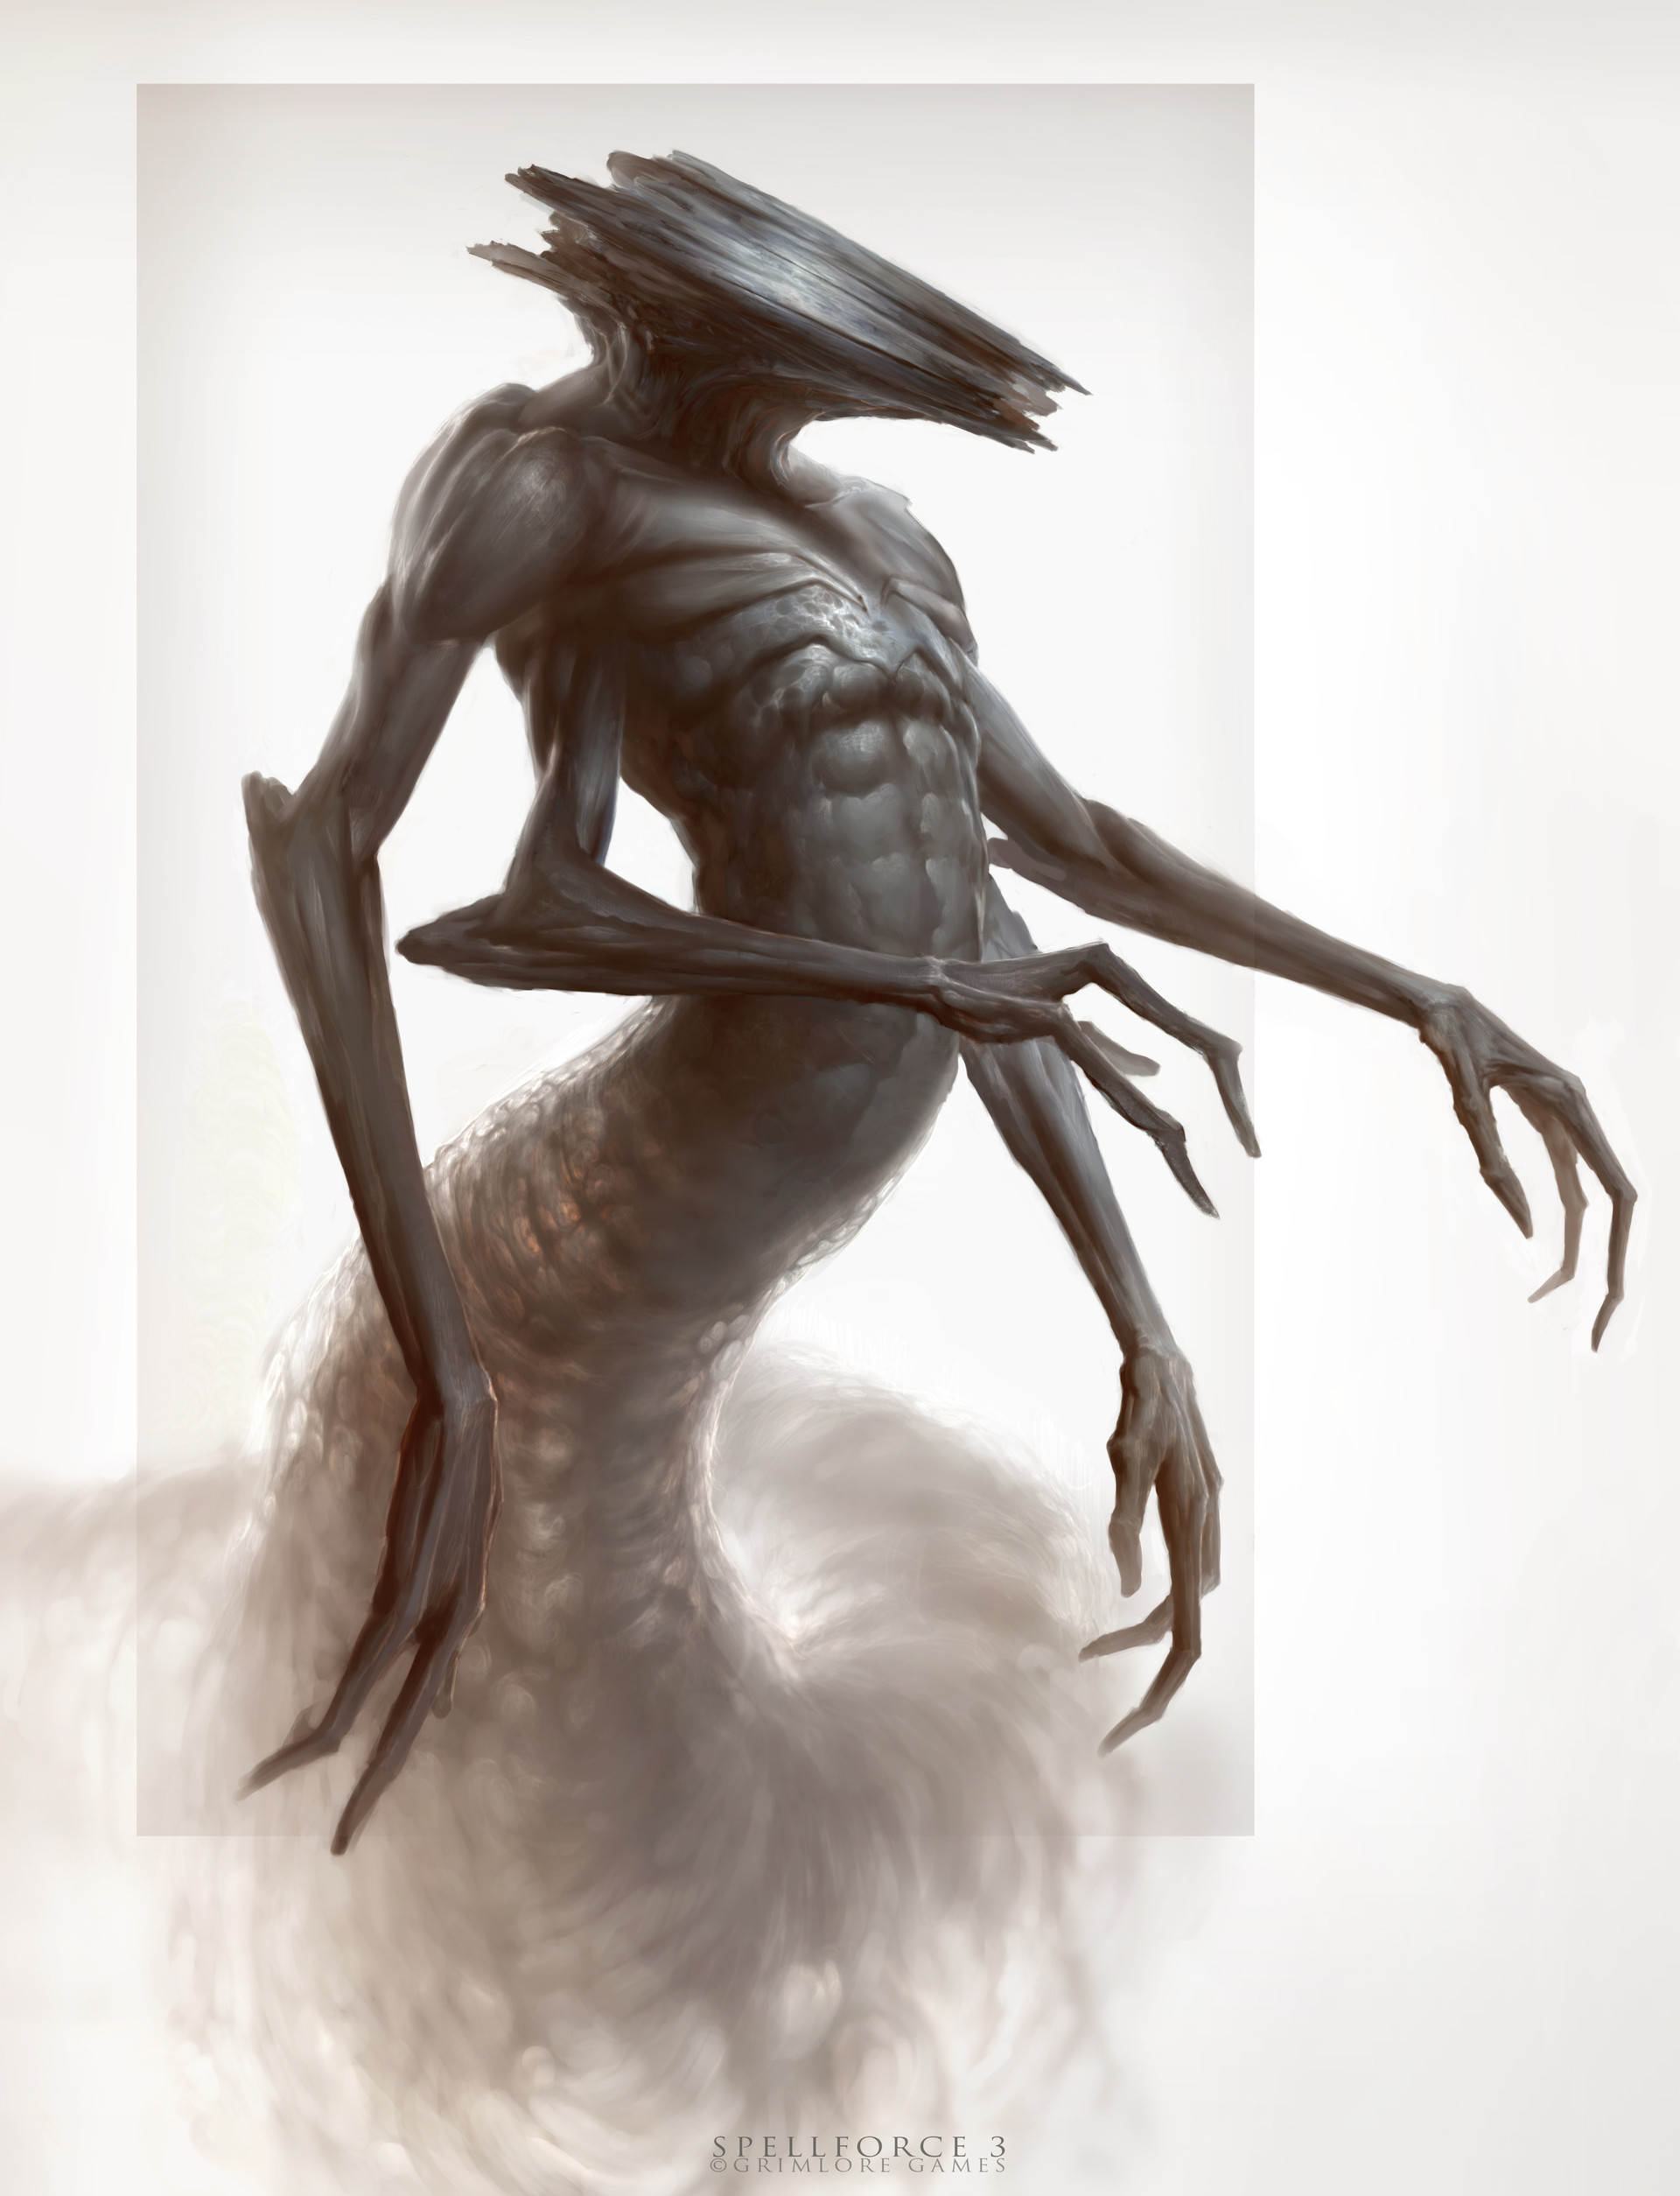 raphael-lubke-creatures-archdemon-1.jpg